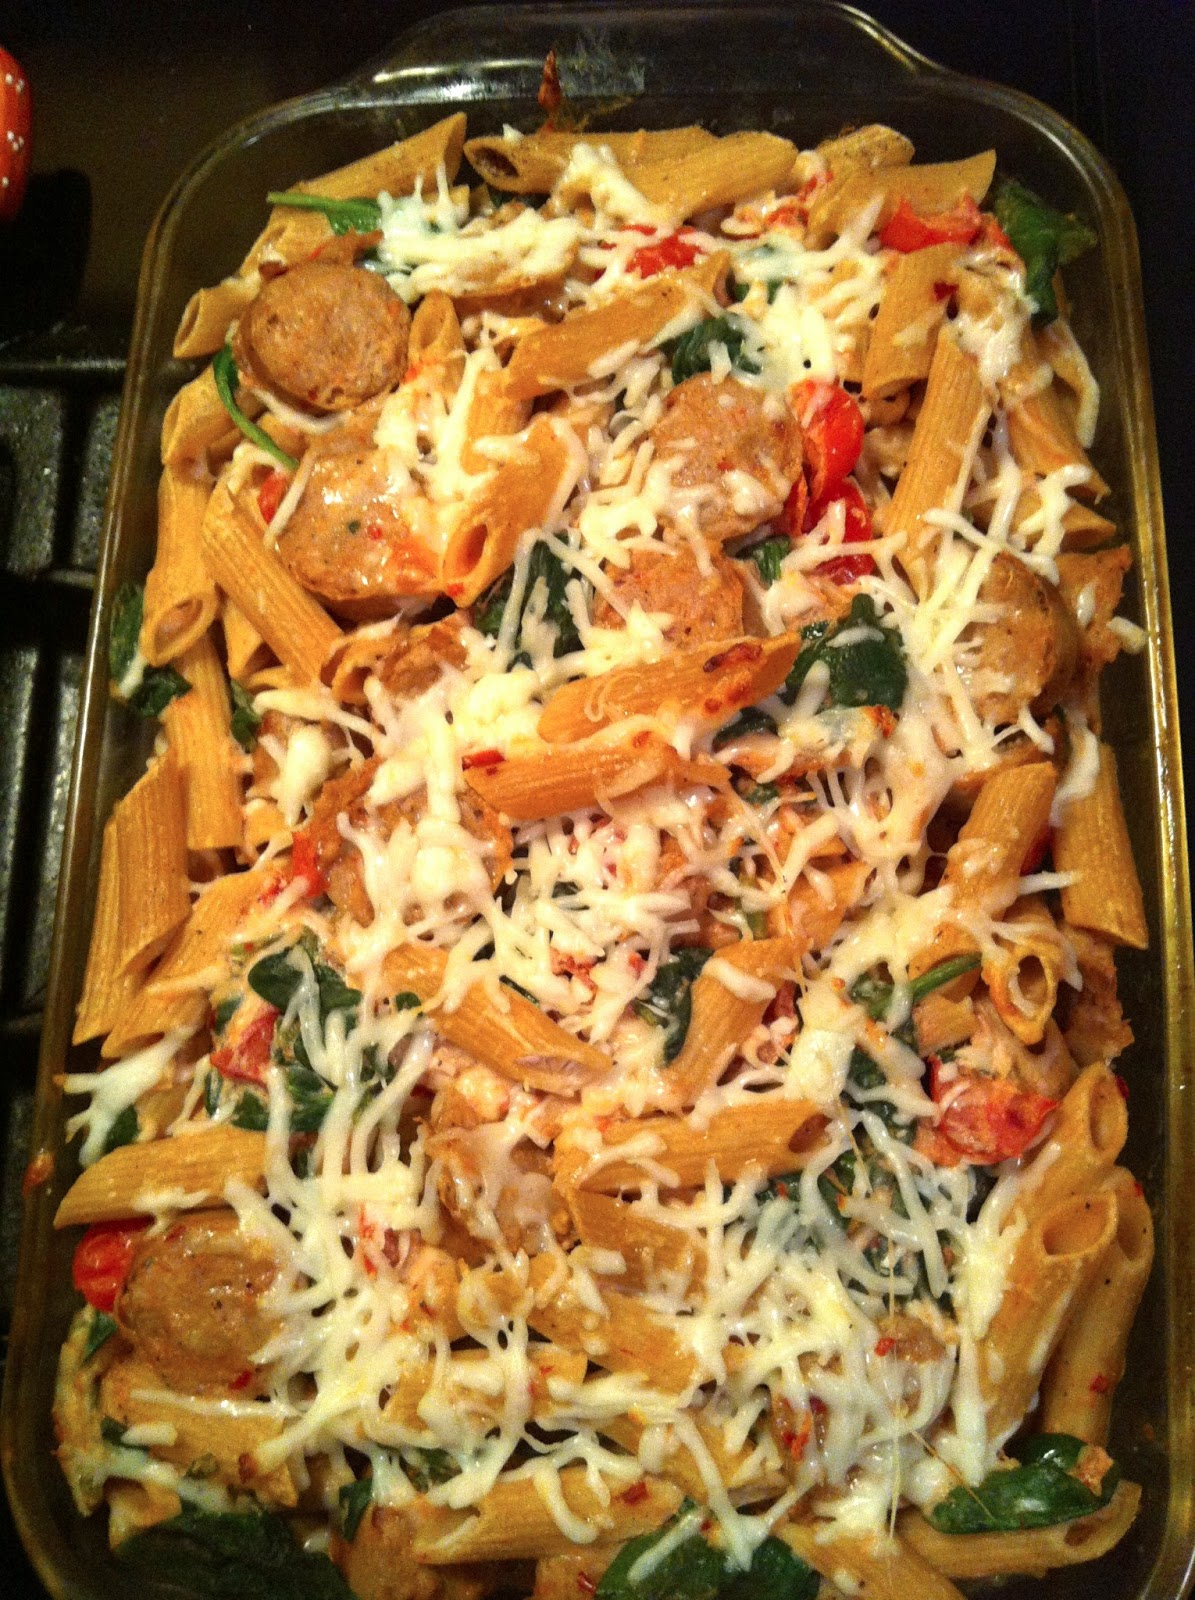 light pasta bake with chicken sausage, mozzarella, spinach & tomatoes